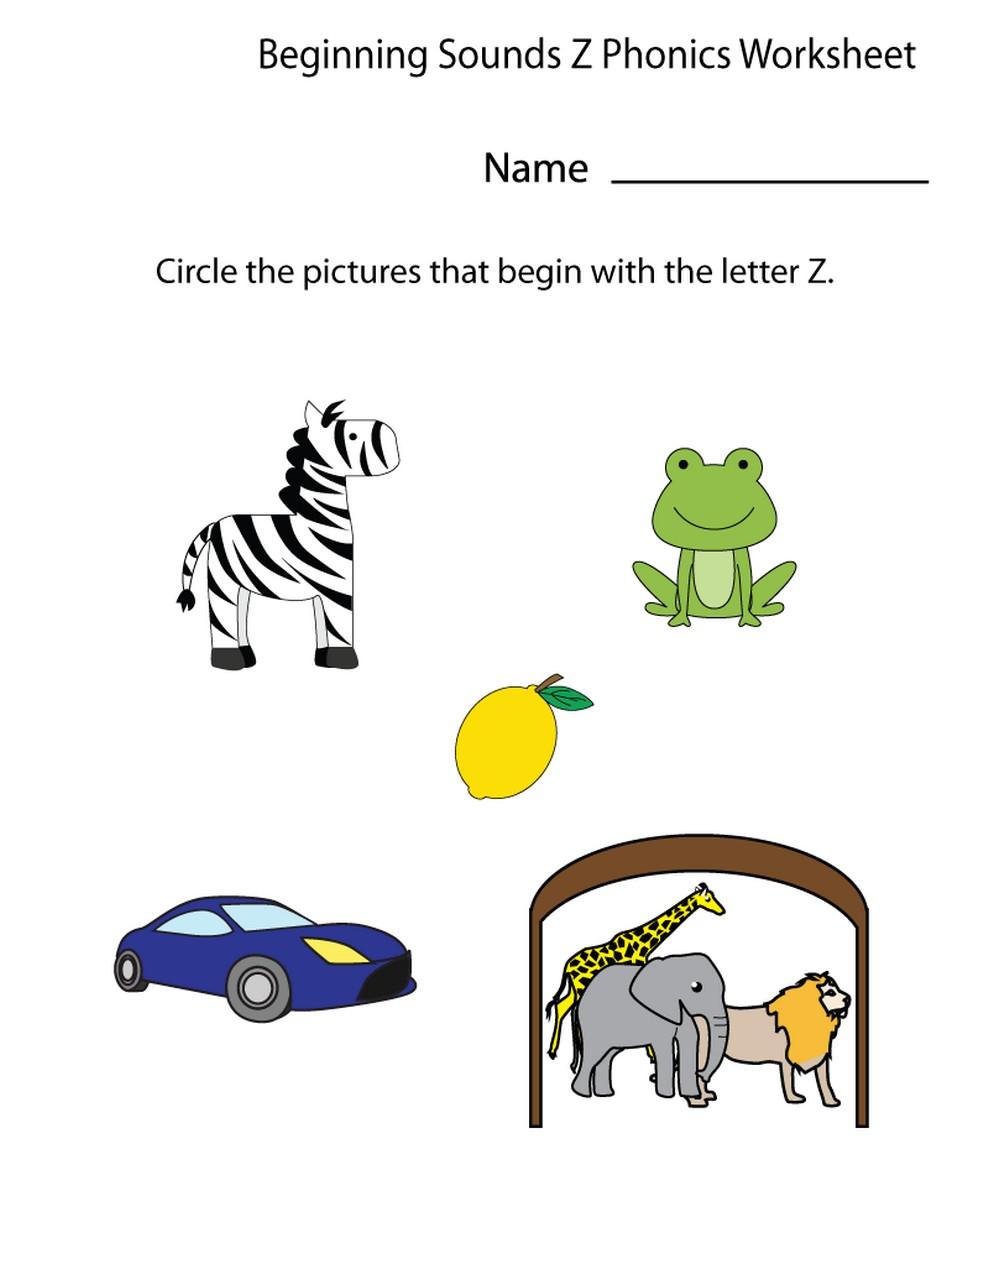 z worksheets printable fun